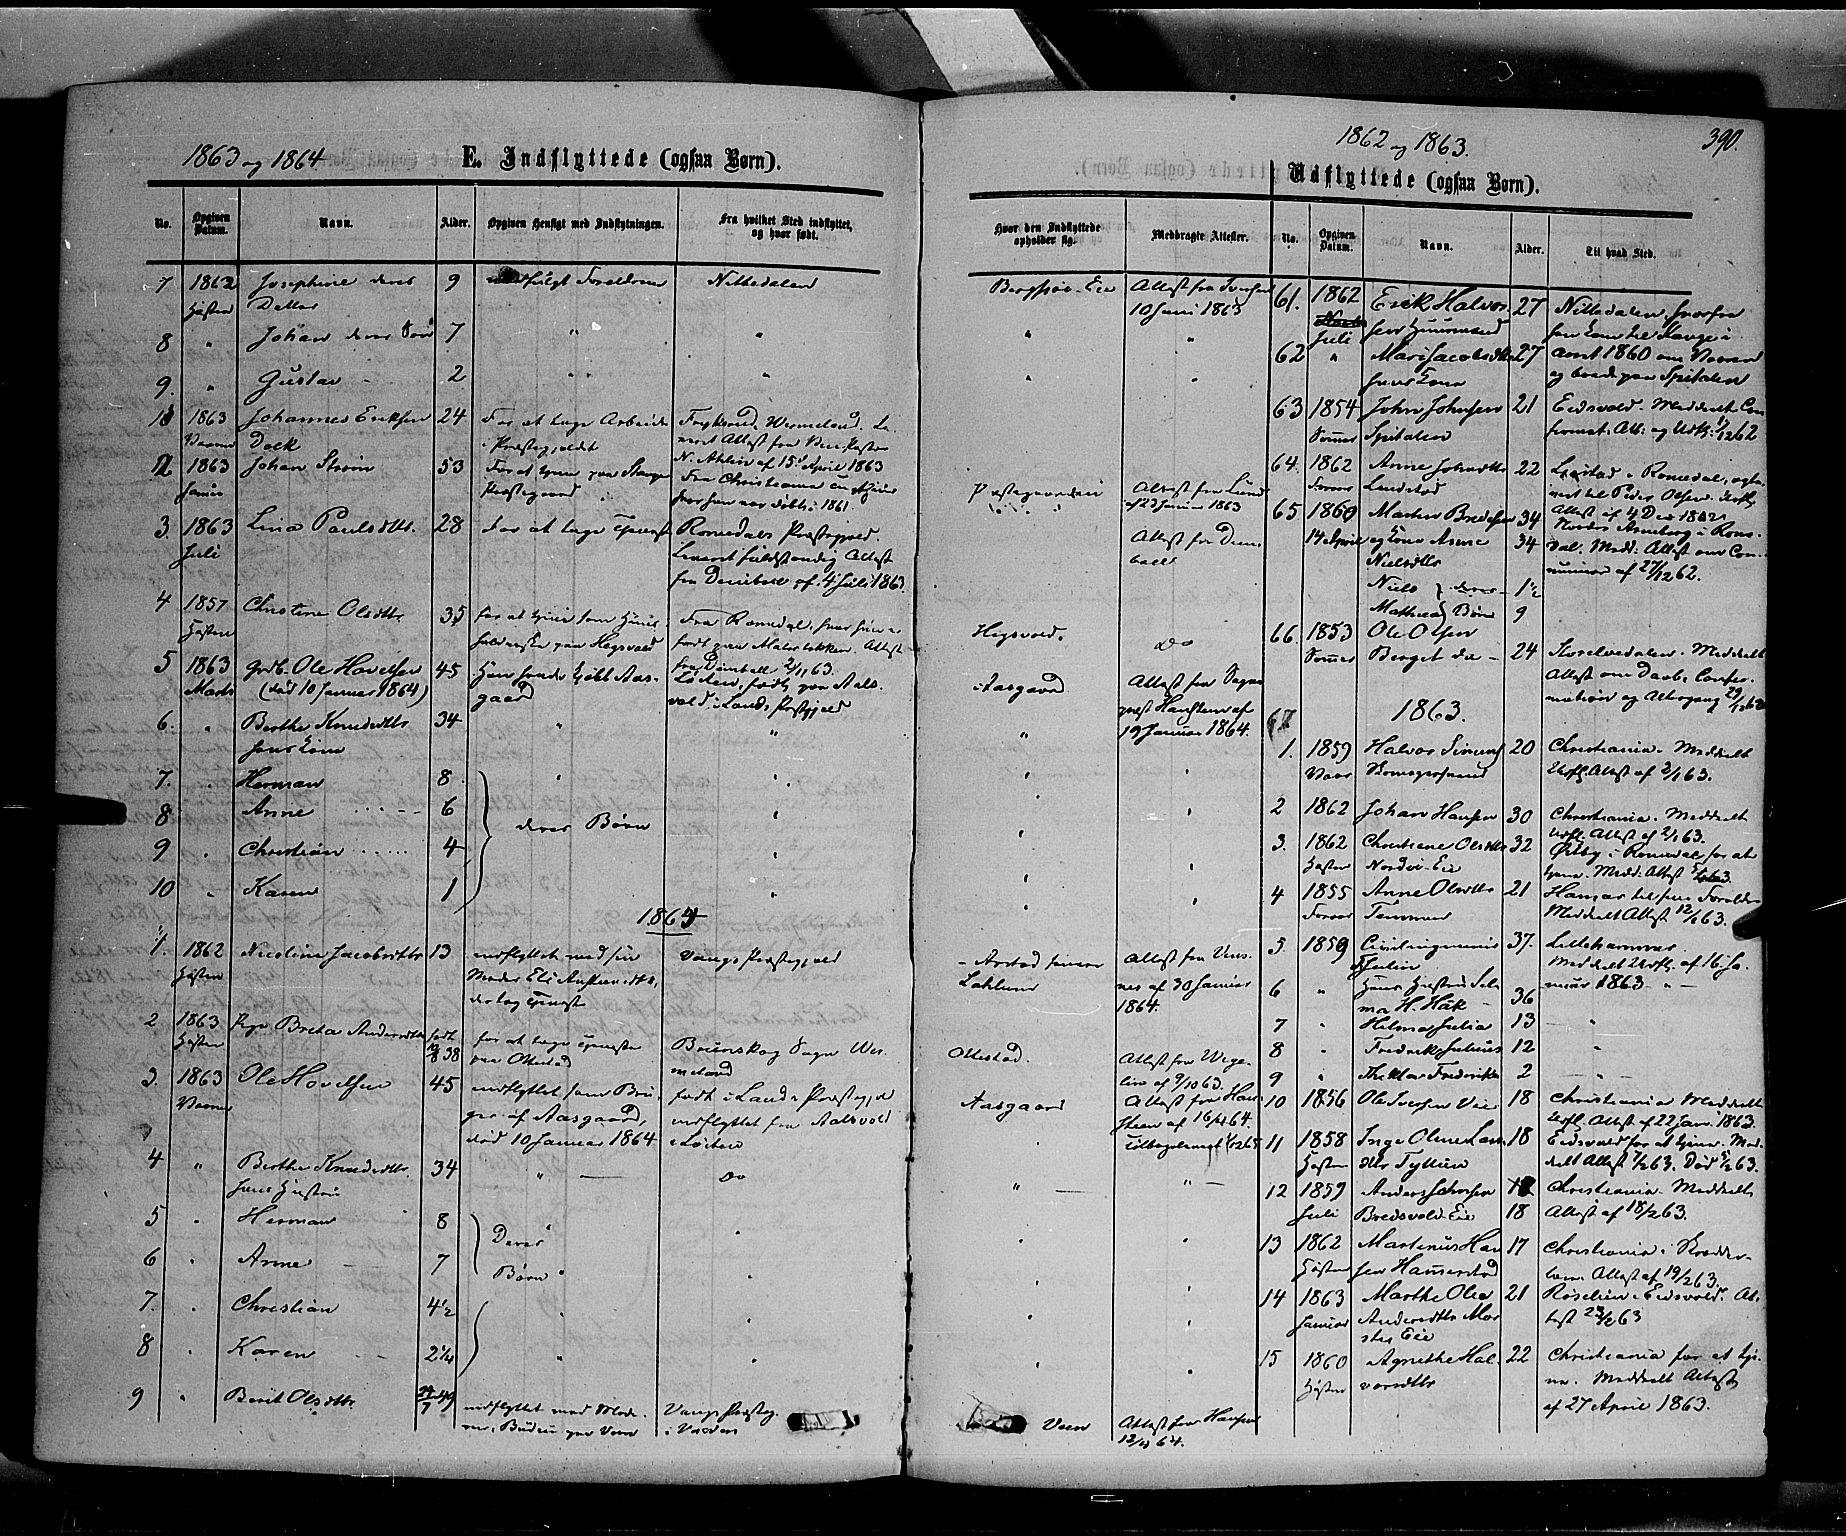 SAH, Stange prestekontor, K/L0013: Ministerialbok nr. 13, 1862-1879, s. 390